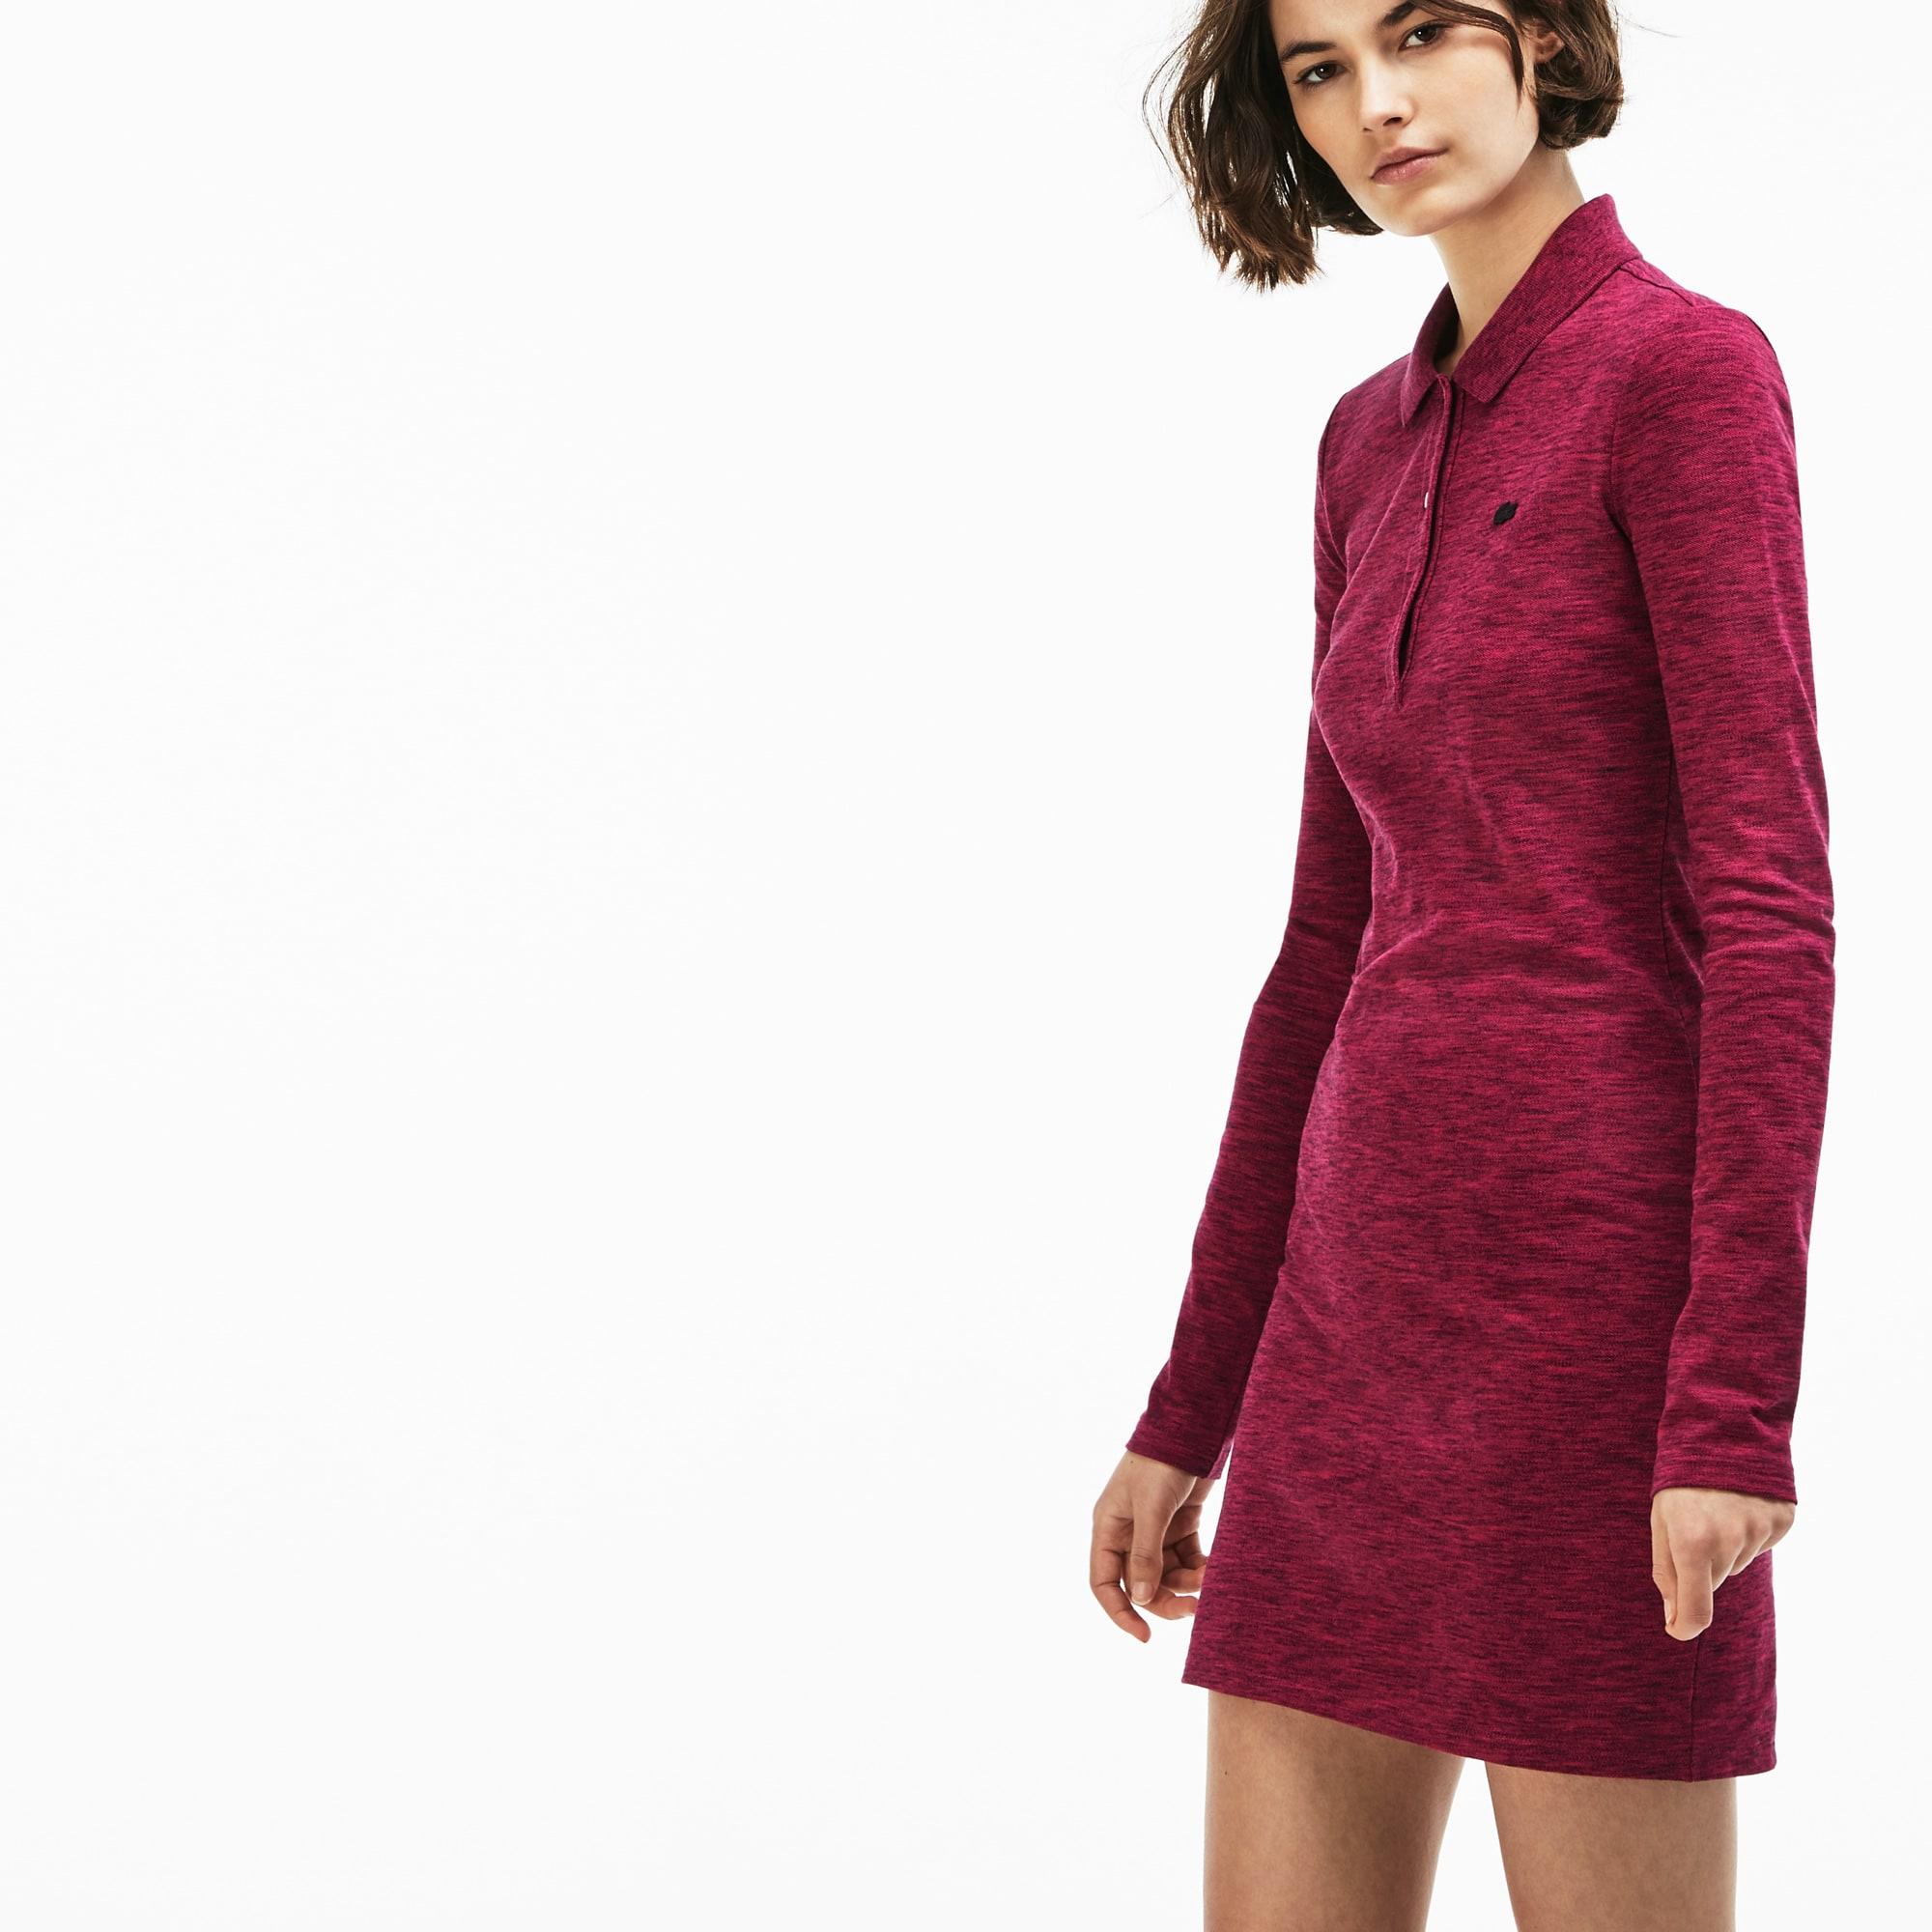 a01d7e89ad2 Robe polo slim fit Lacoste LIVE en mini piqué stretch ...